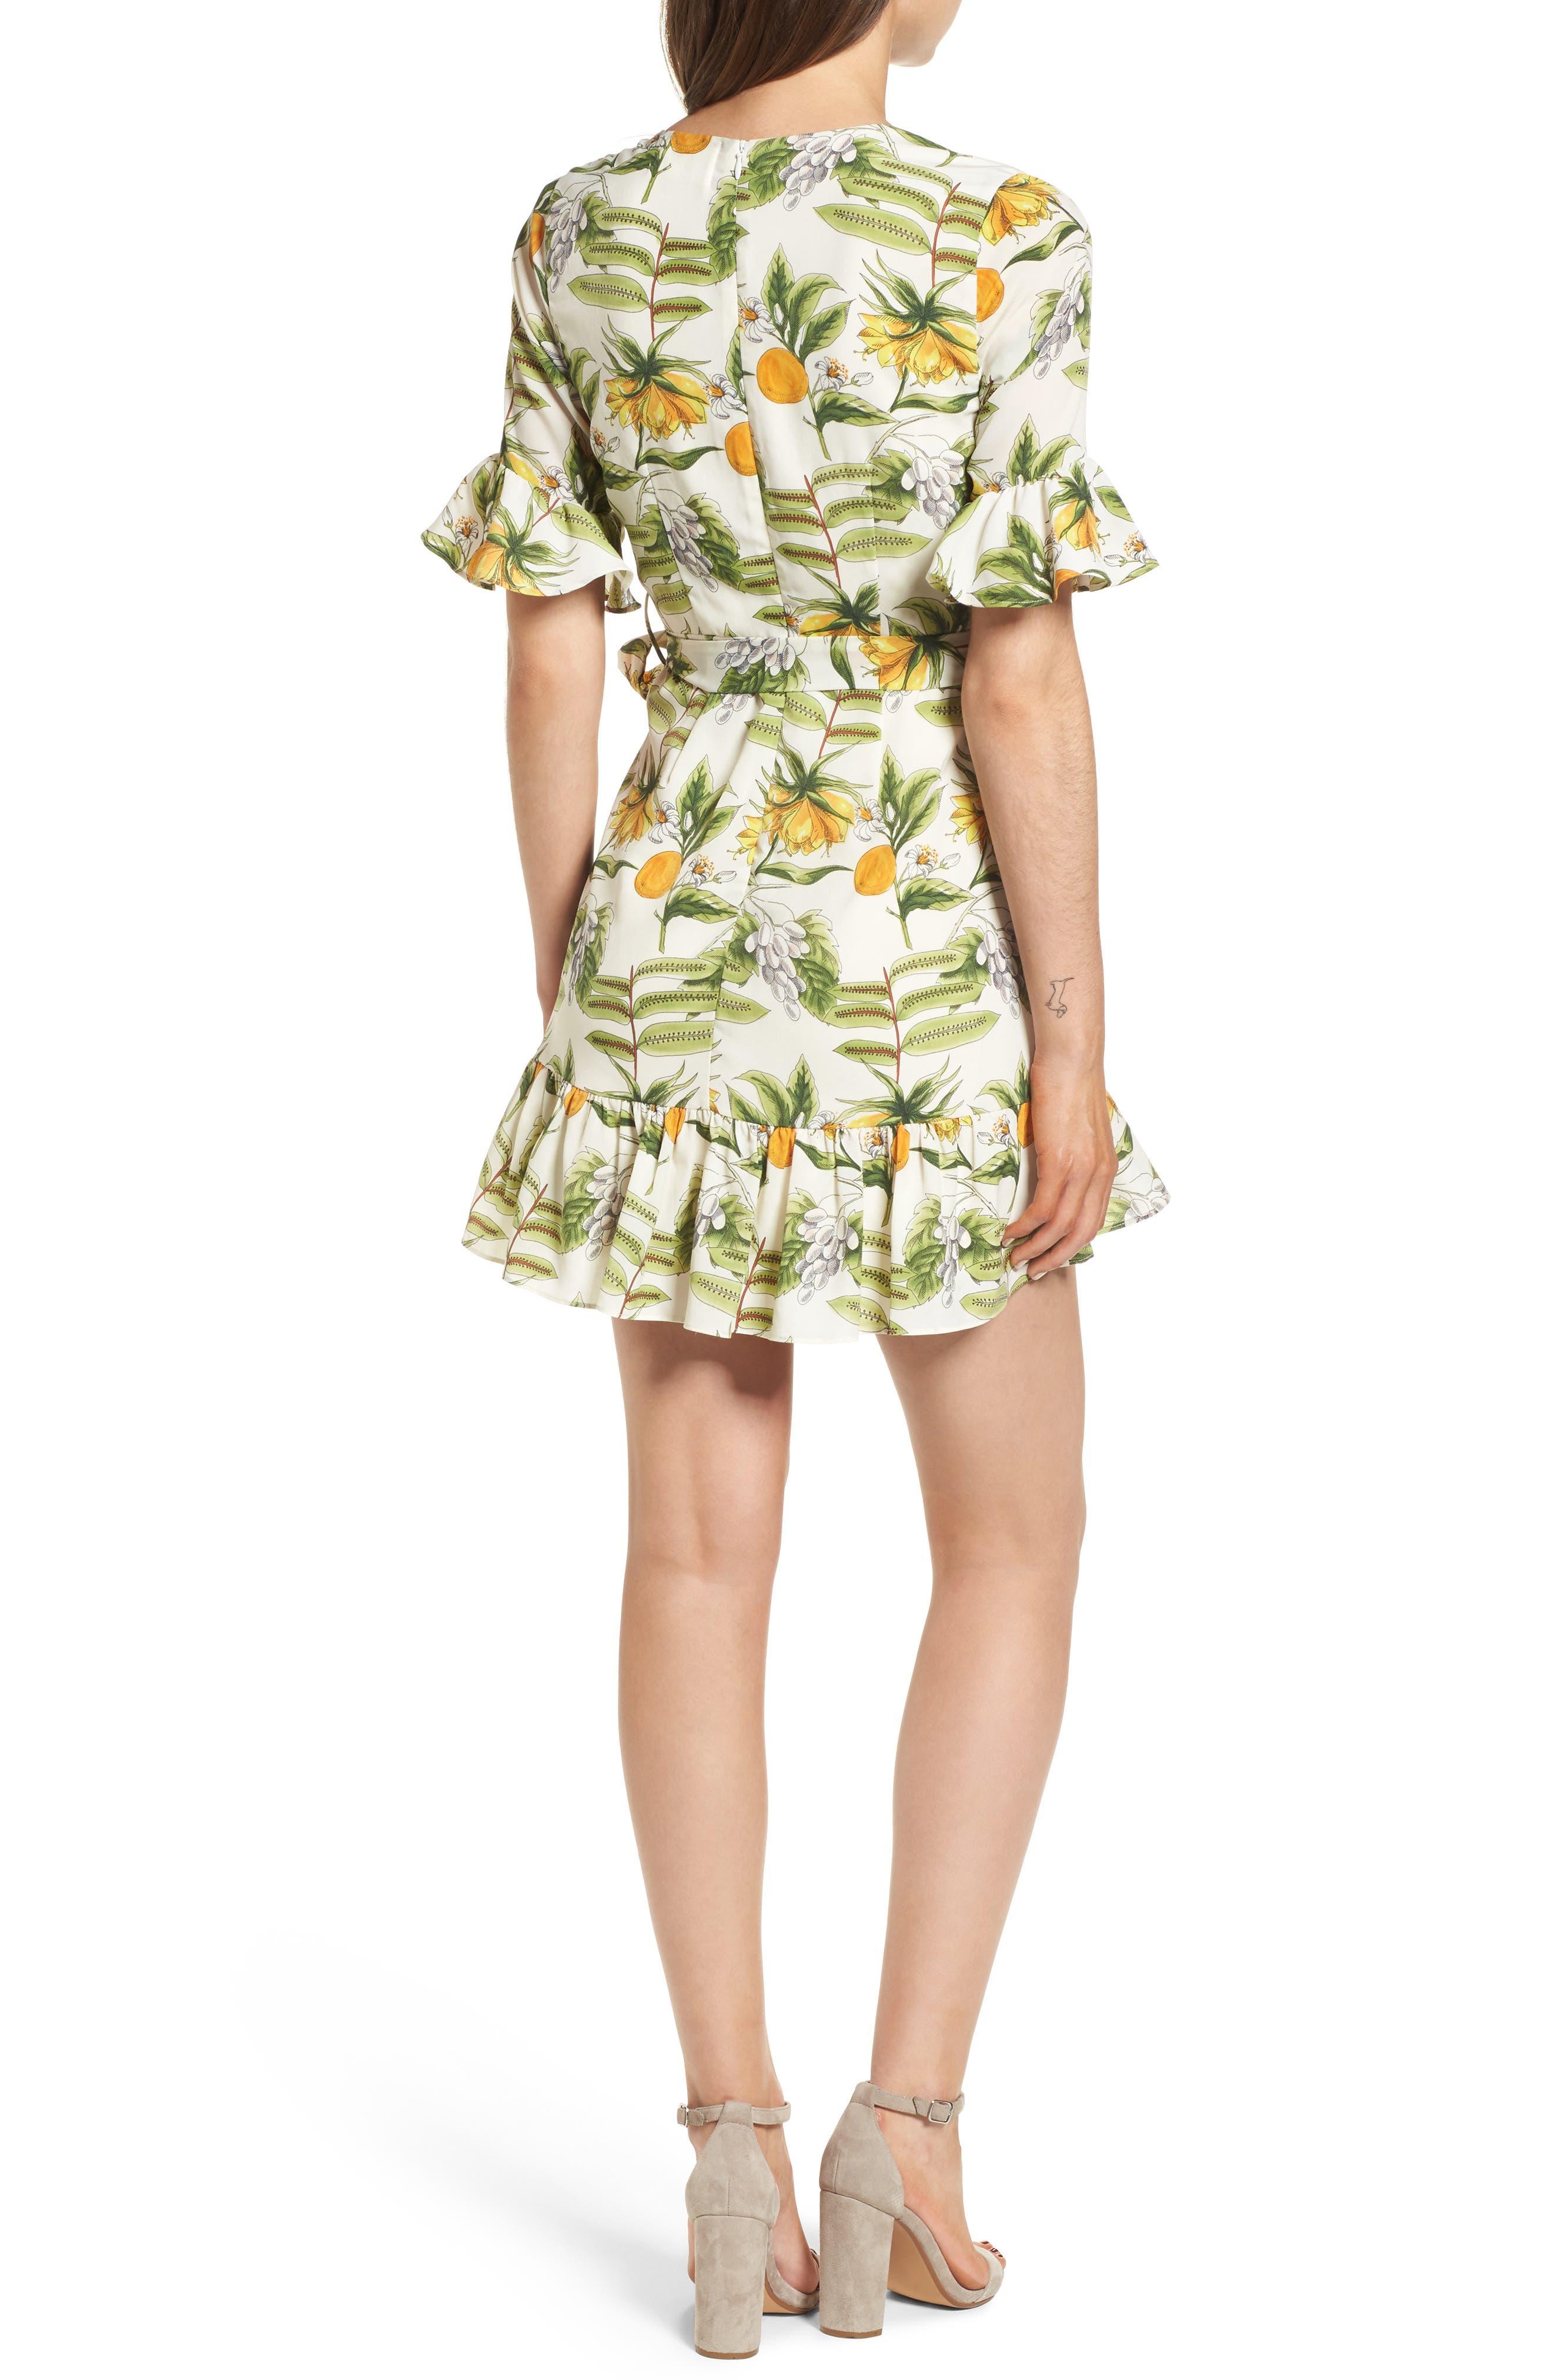 Limonada Citrus Dress,                             Alternate thumbnail 2, color,                             IVORY/ YELLOW